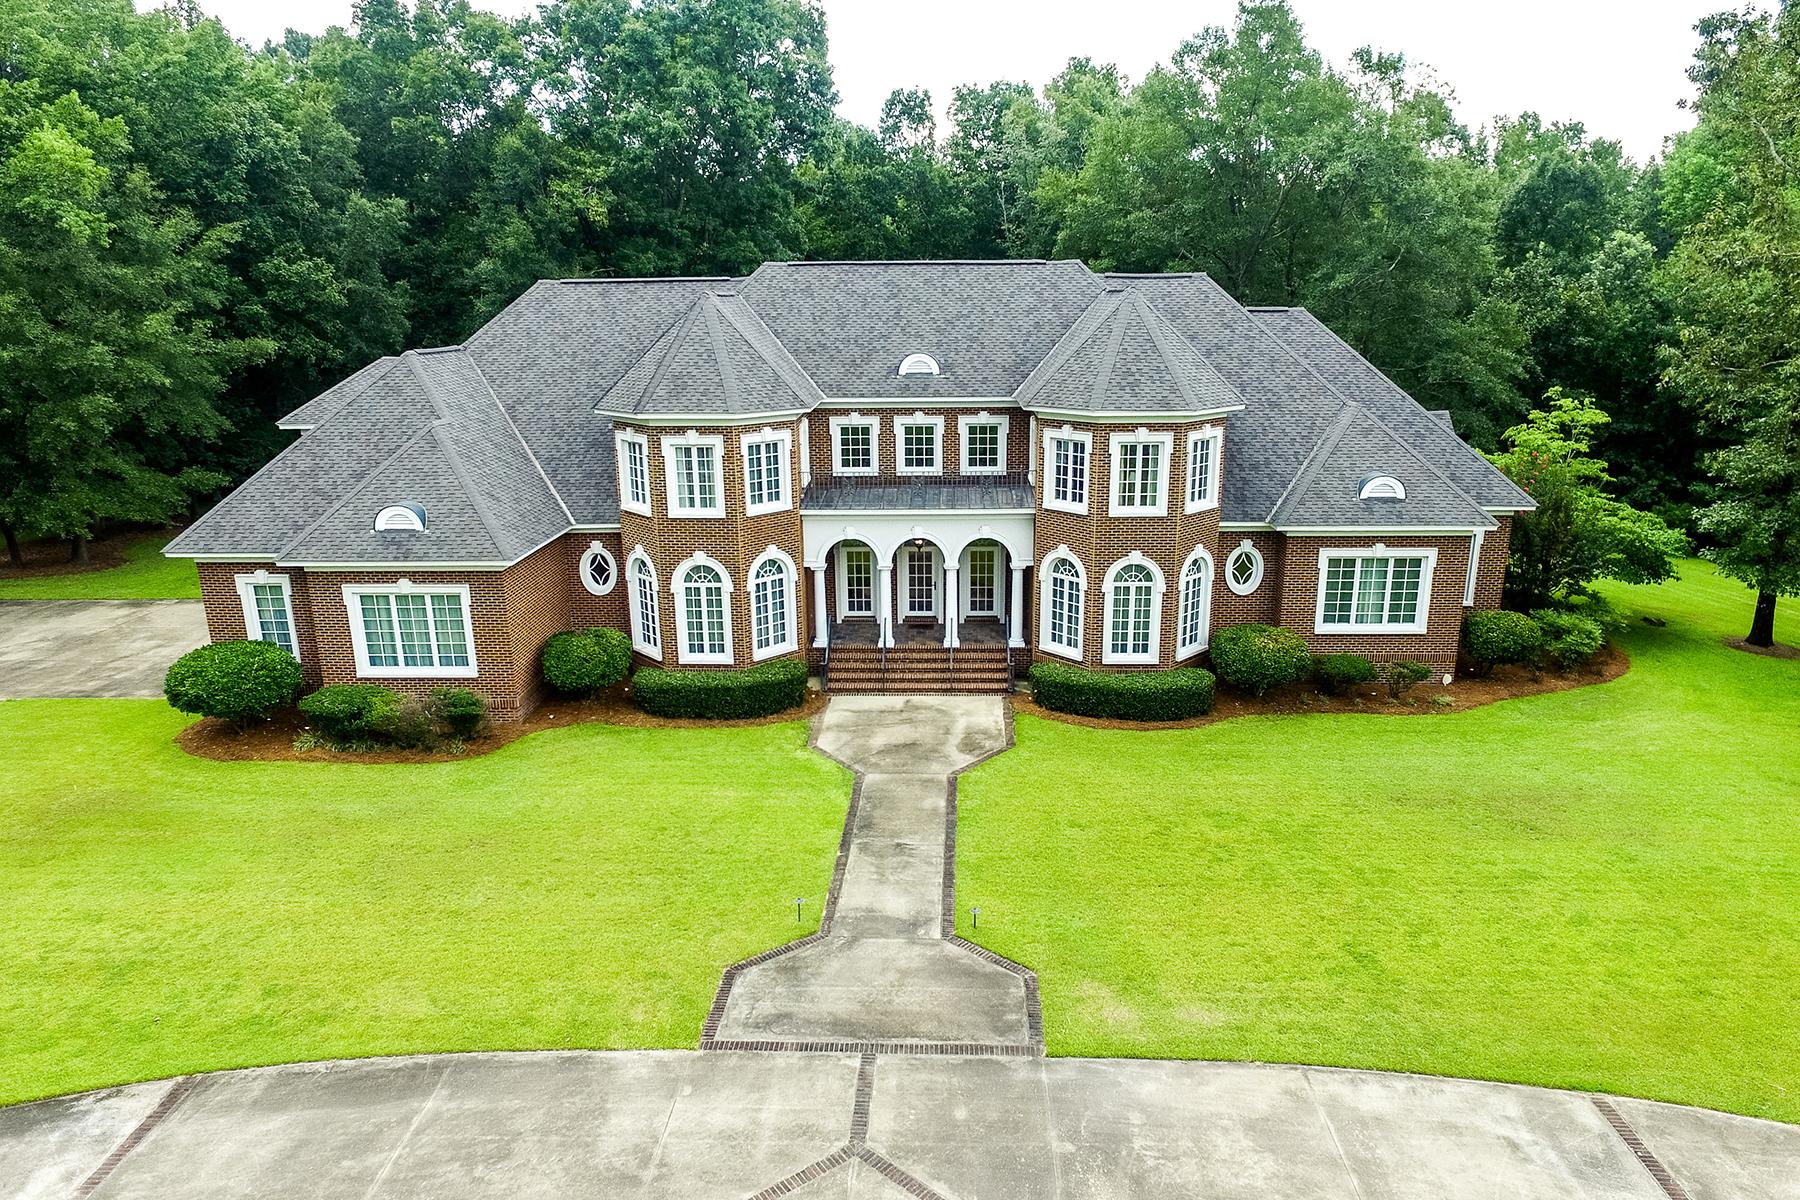 Single Family Home for Sale at 35 S Duke Street 35 S Dukes Street Summerton, South Carolina, 29148 United States